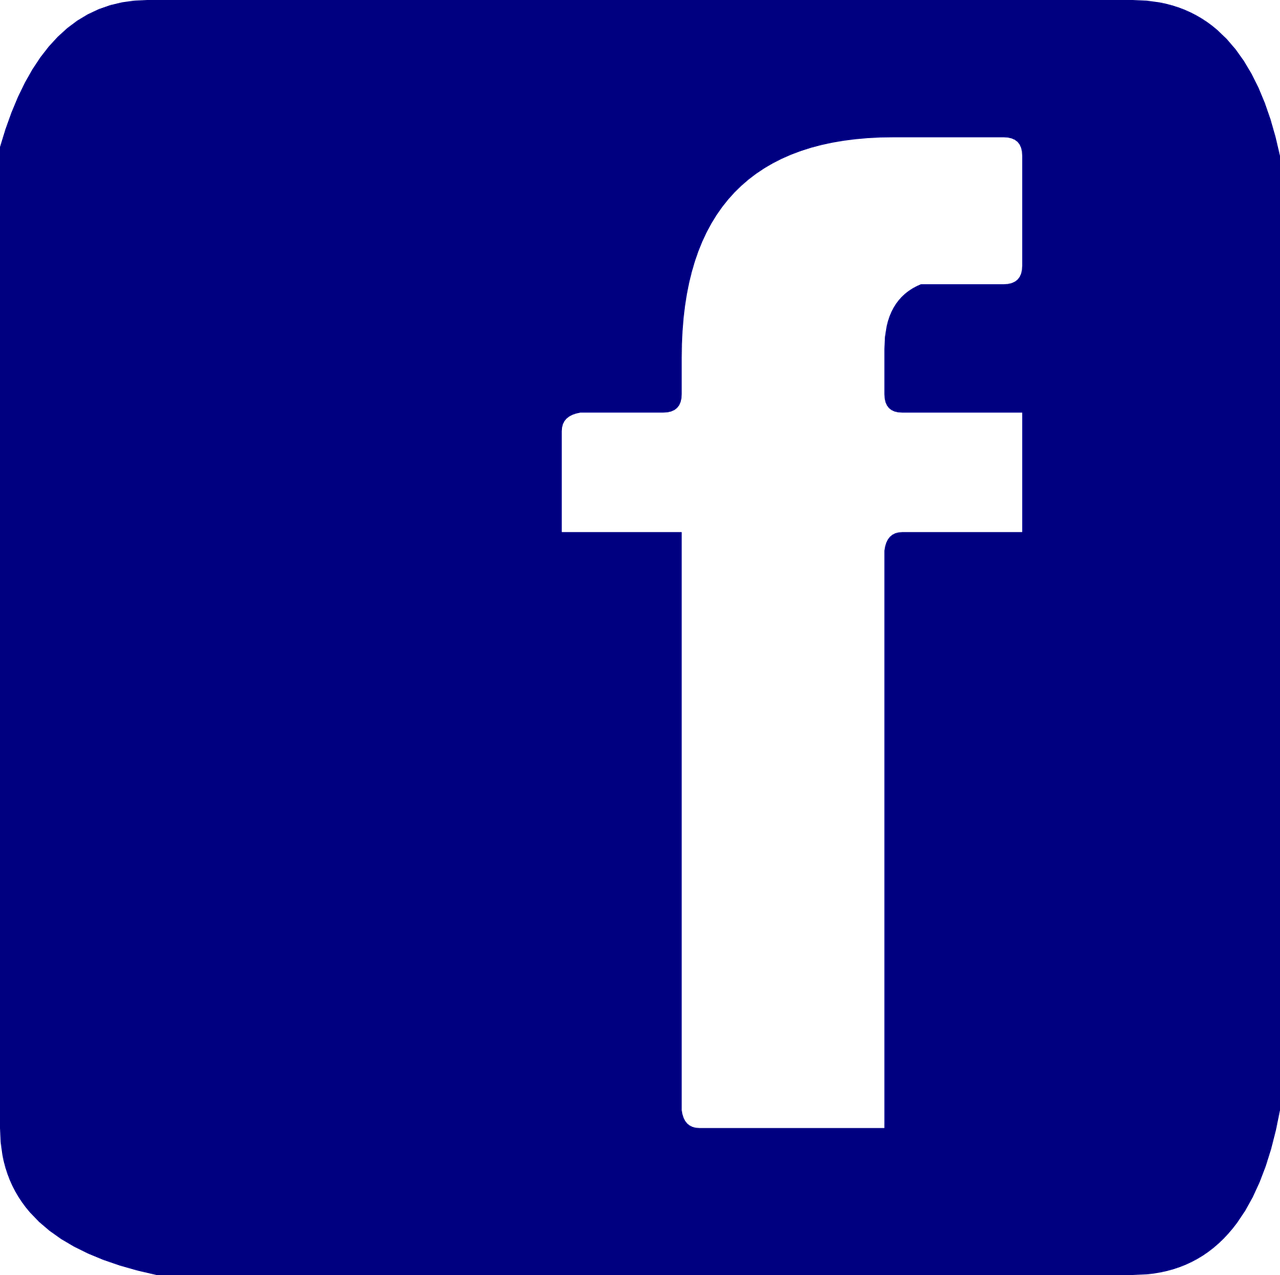 Facebook users in 2018